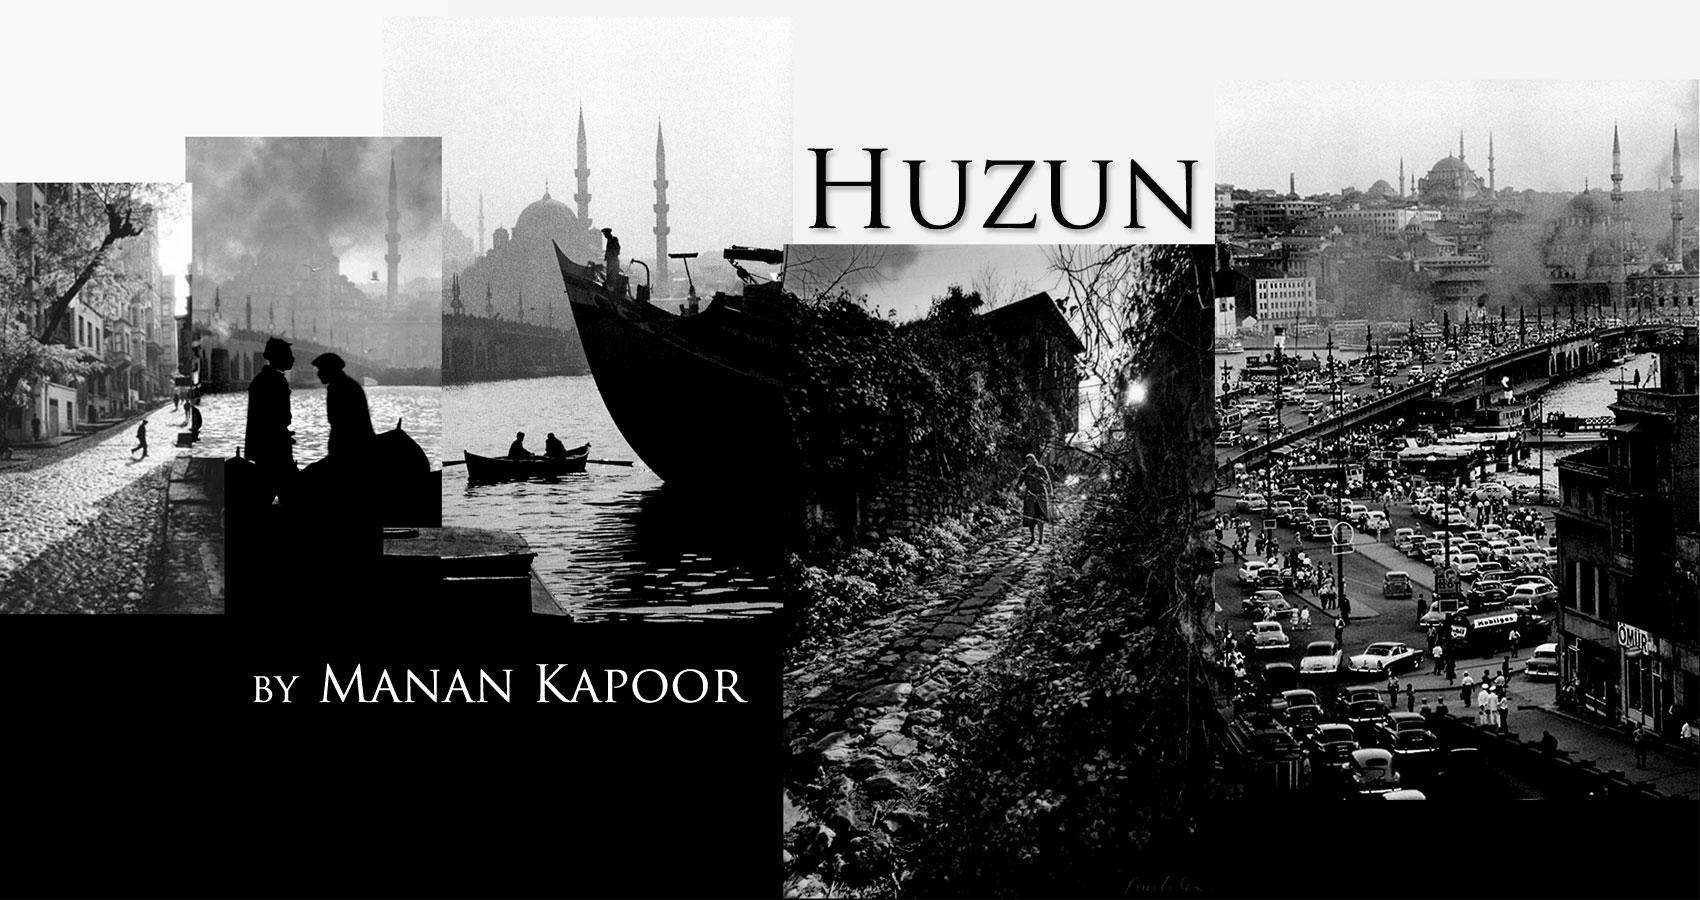 Huzun by Manan Kapoor at Spillwords.com